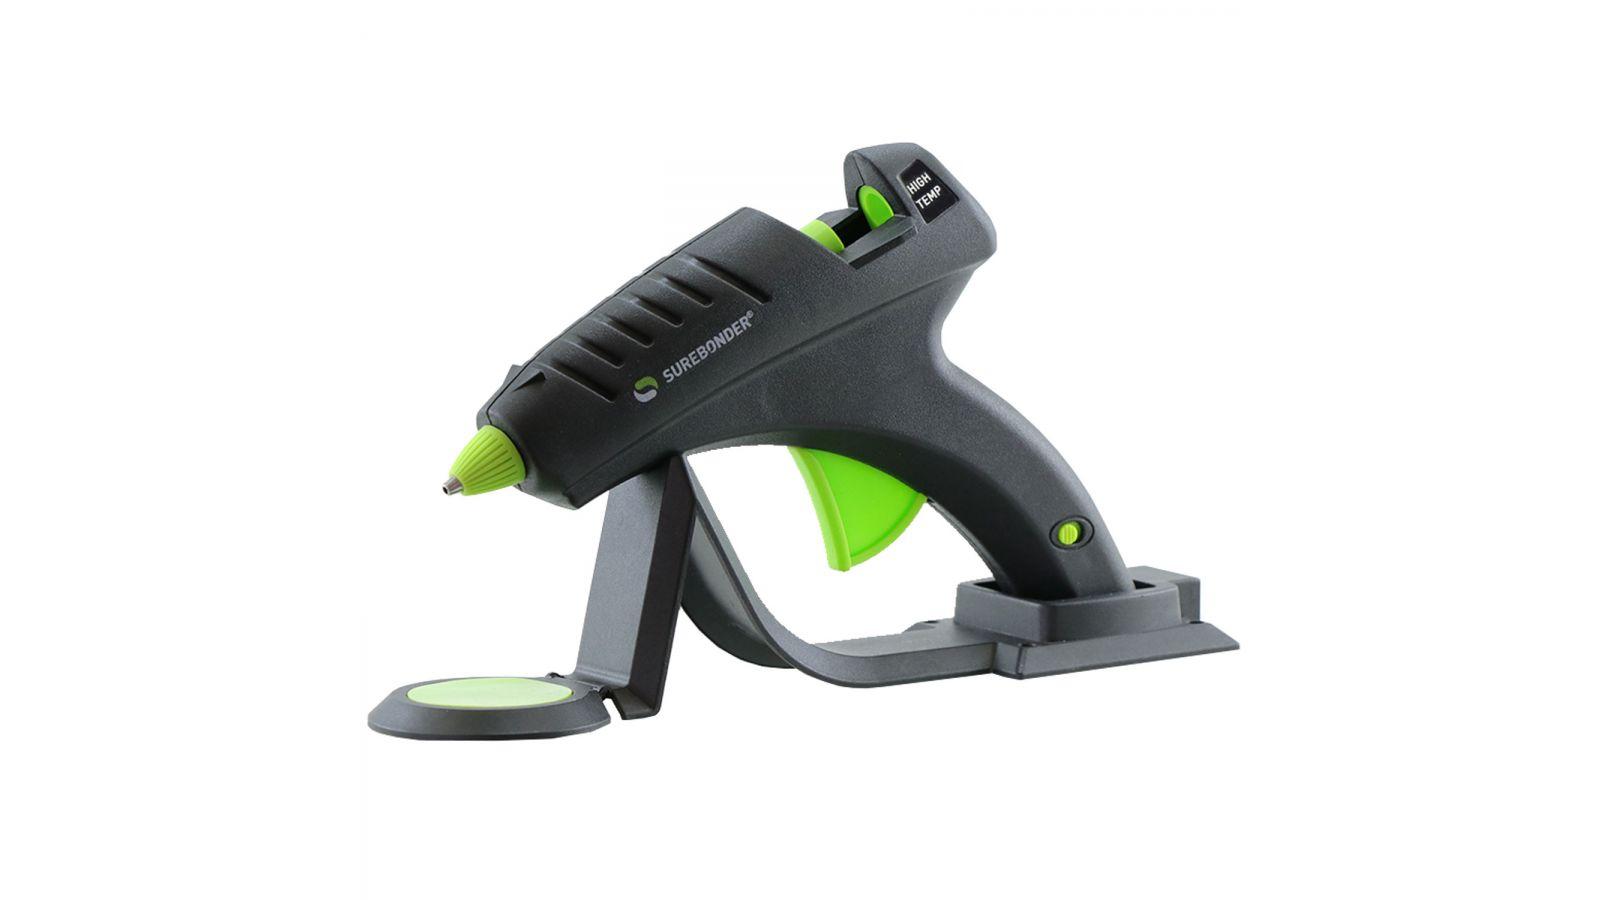 Cordless/Corded Full Size High Temp Glue Gun